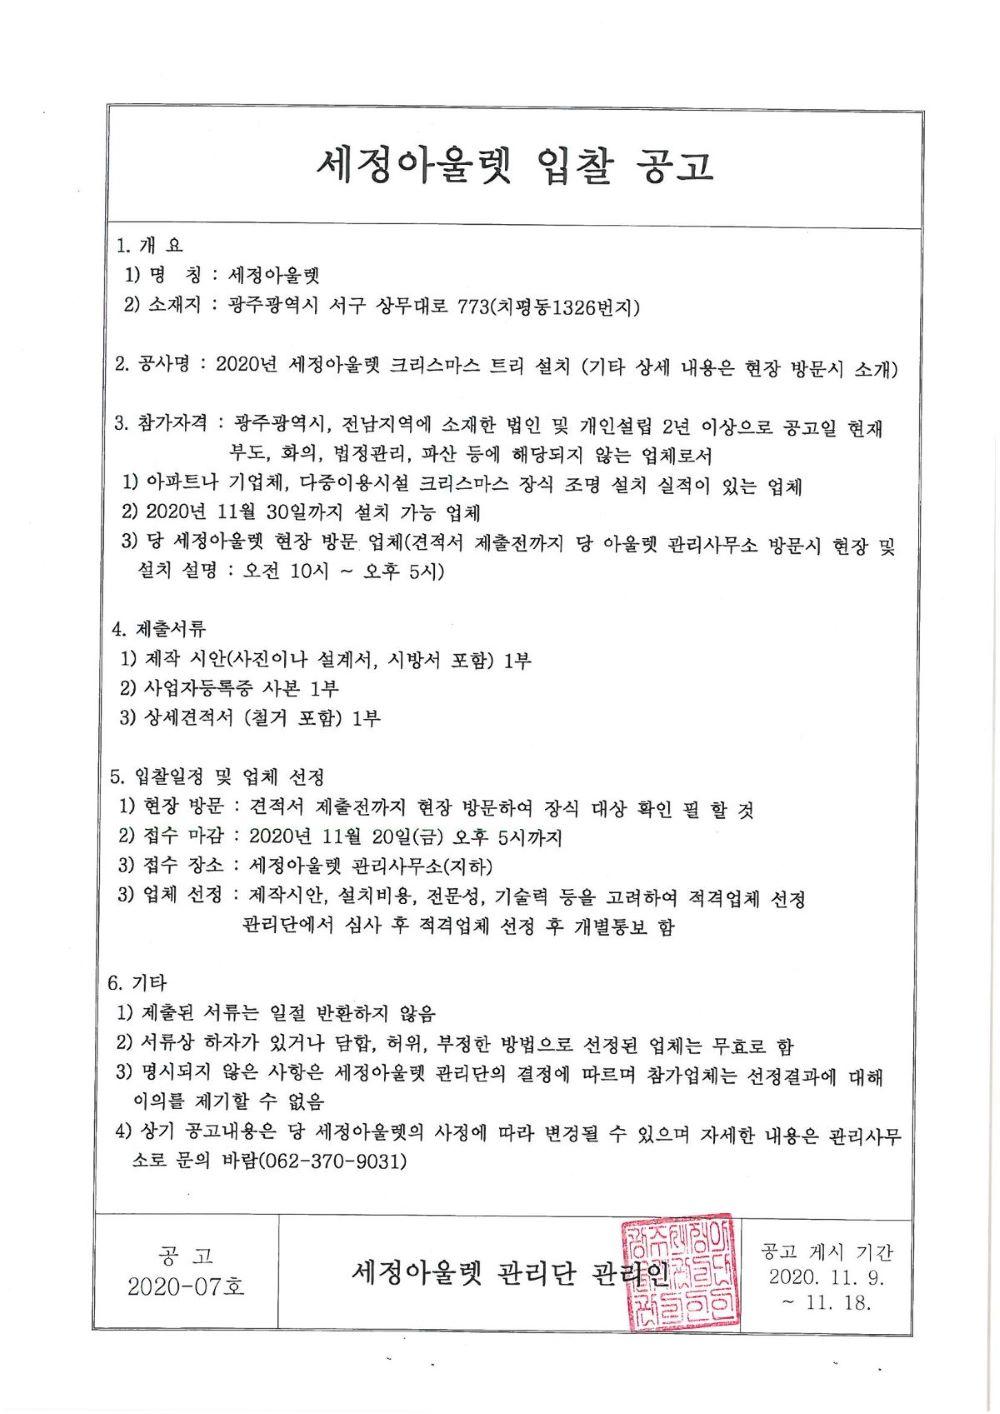 http://www.sejung-outlet.co.kr/bs/se2/imgup/1604898966입찰공고(2020년_크리스마스_설치).jpg